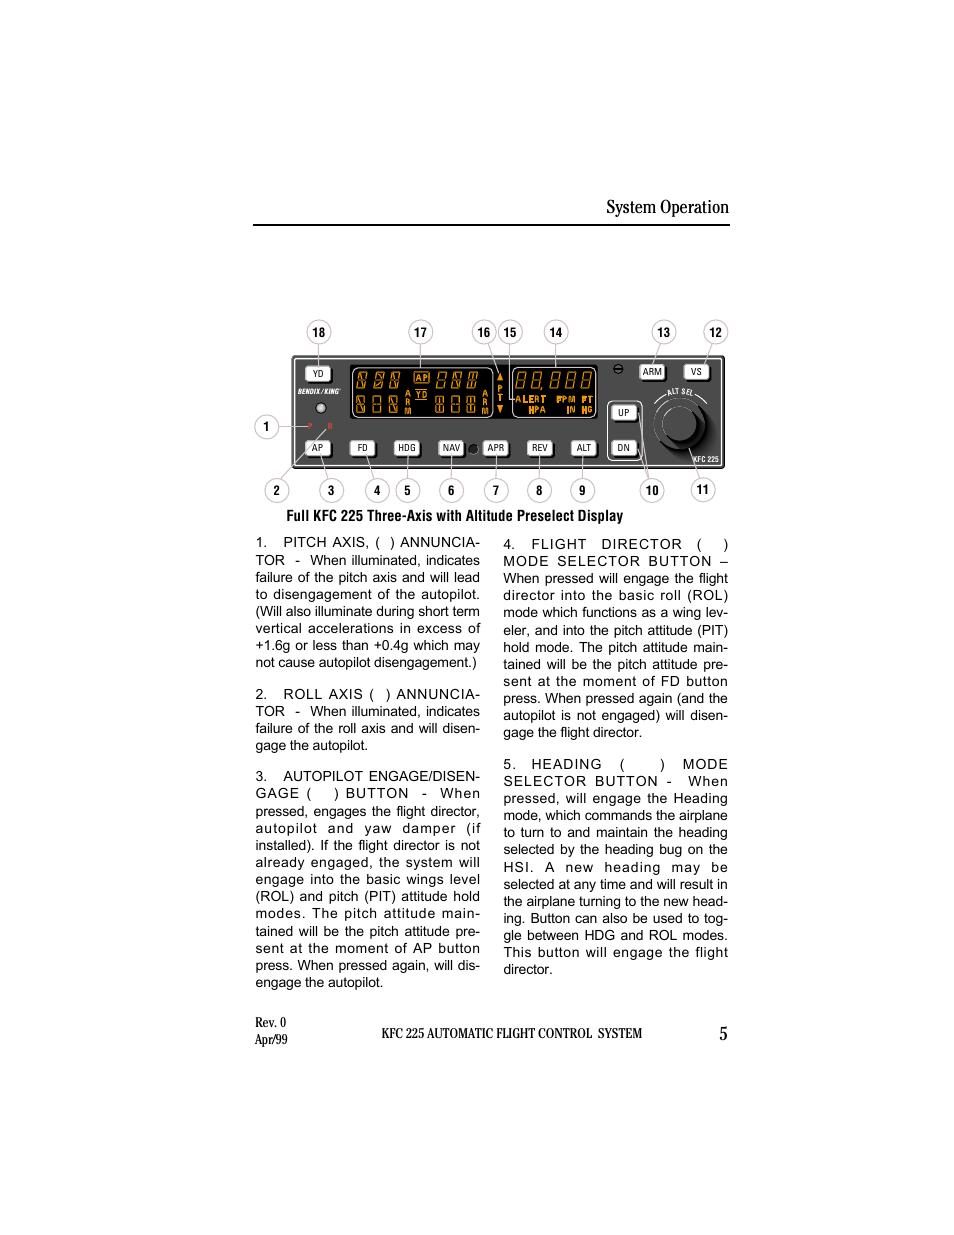 kfc 225 system operation controls and displays operation system rh manualsdir com Bendix King Radio King Avionics Manuals